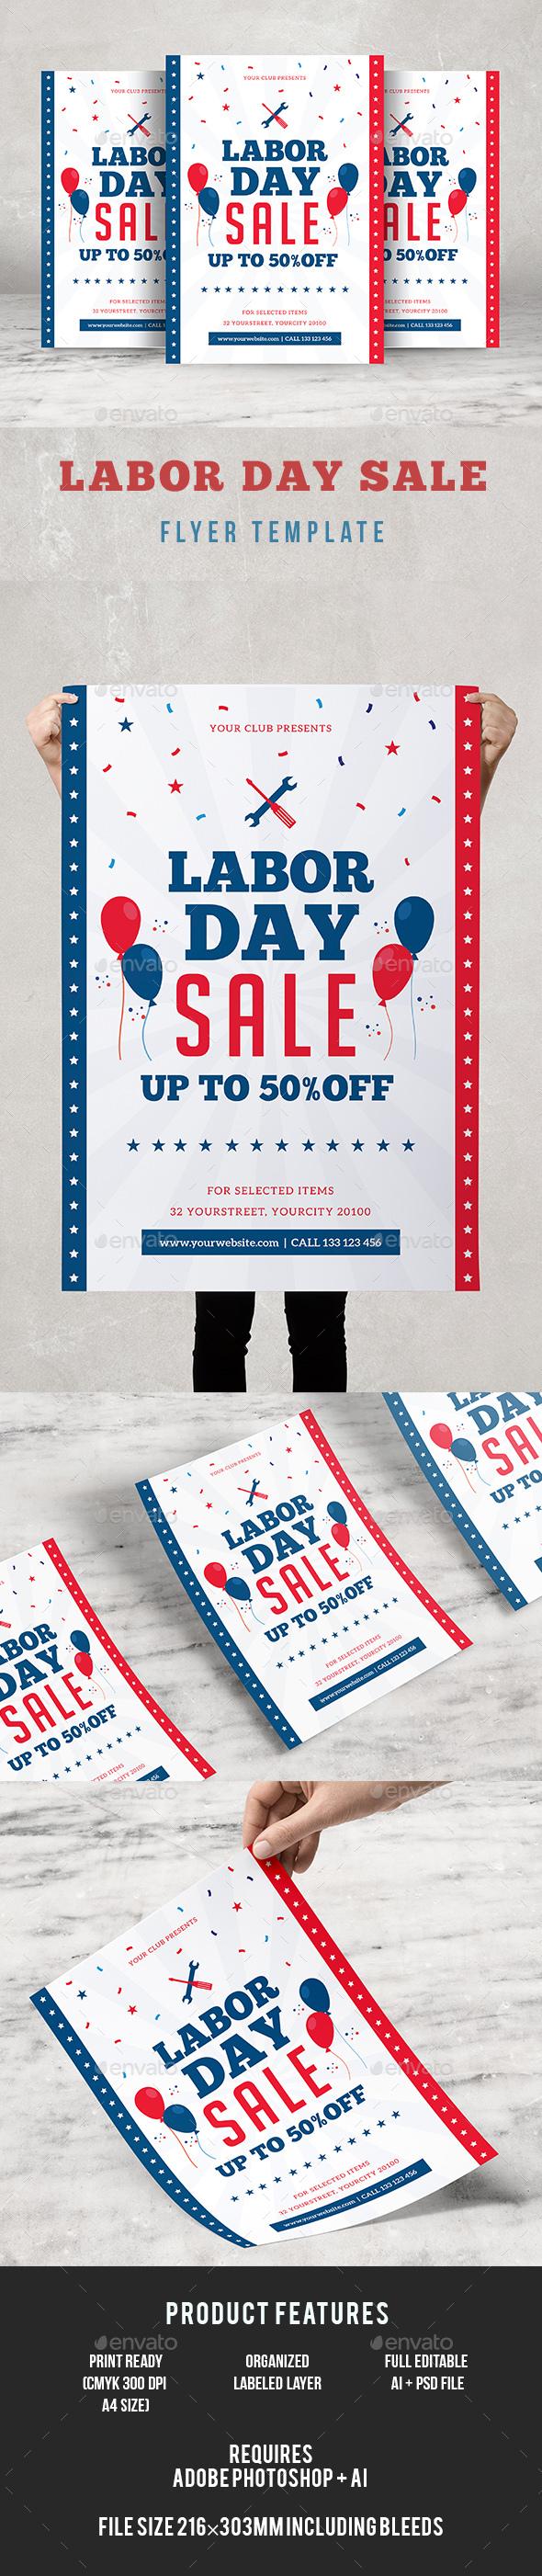 GraphicRiver Labor Day Sale Flyer 20520060